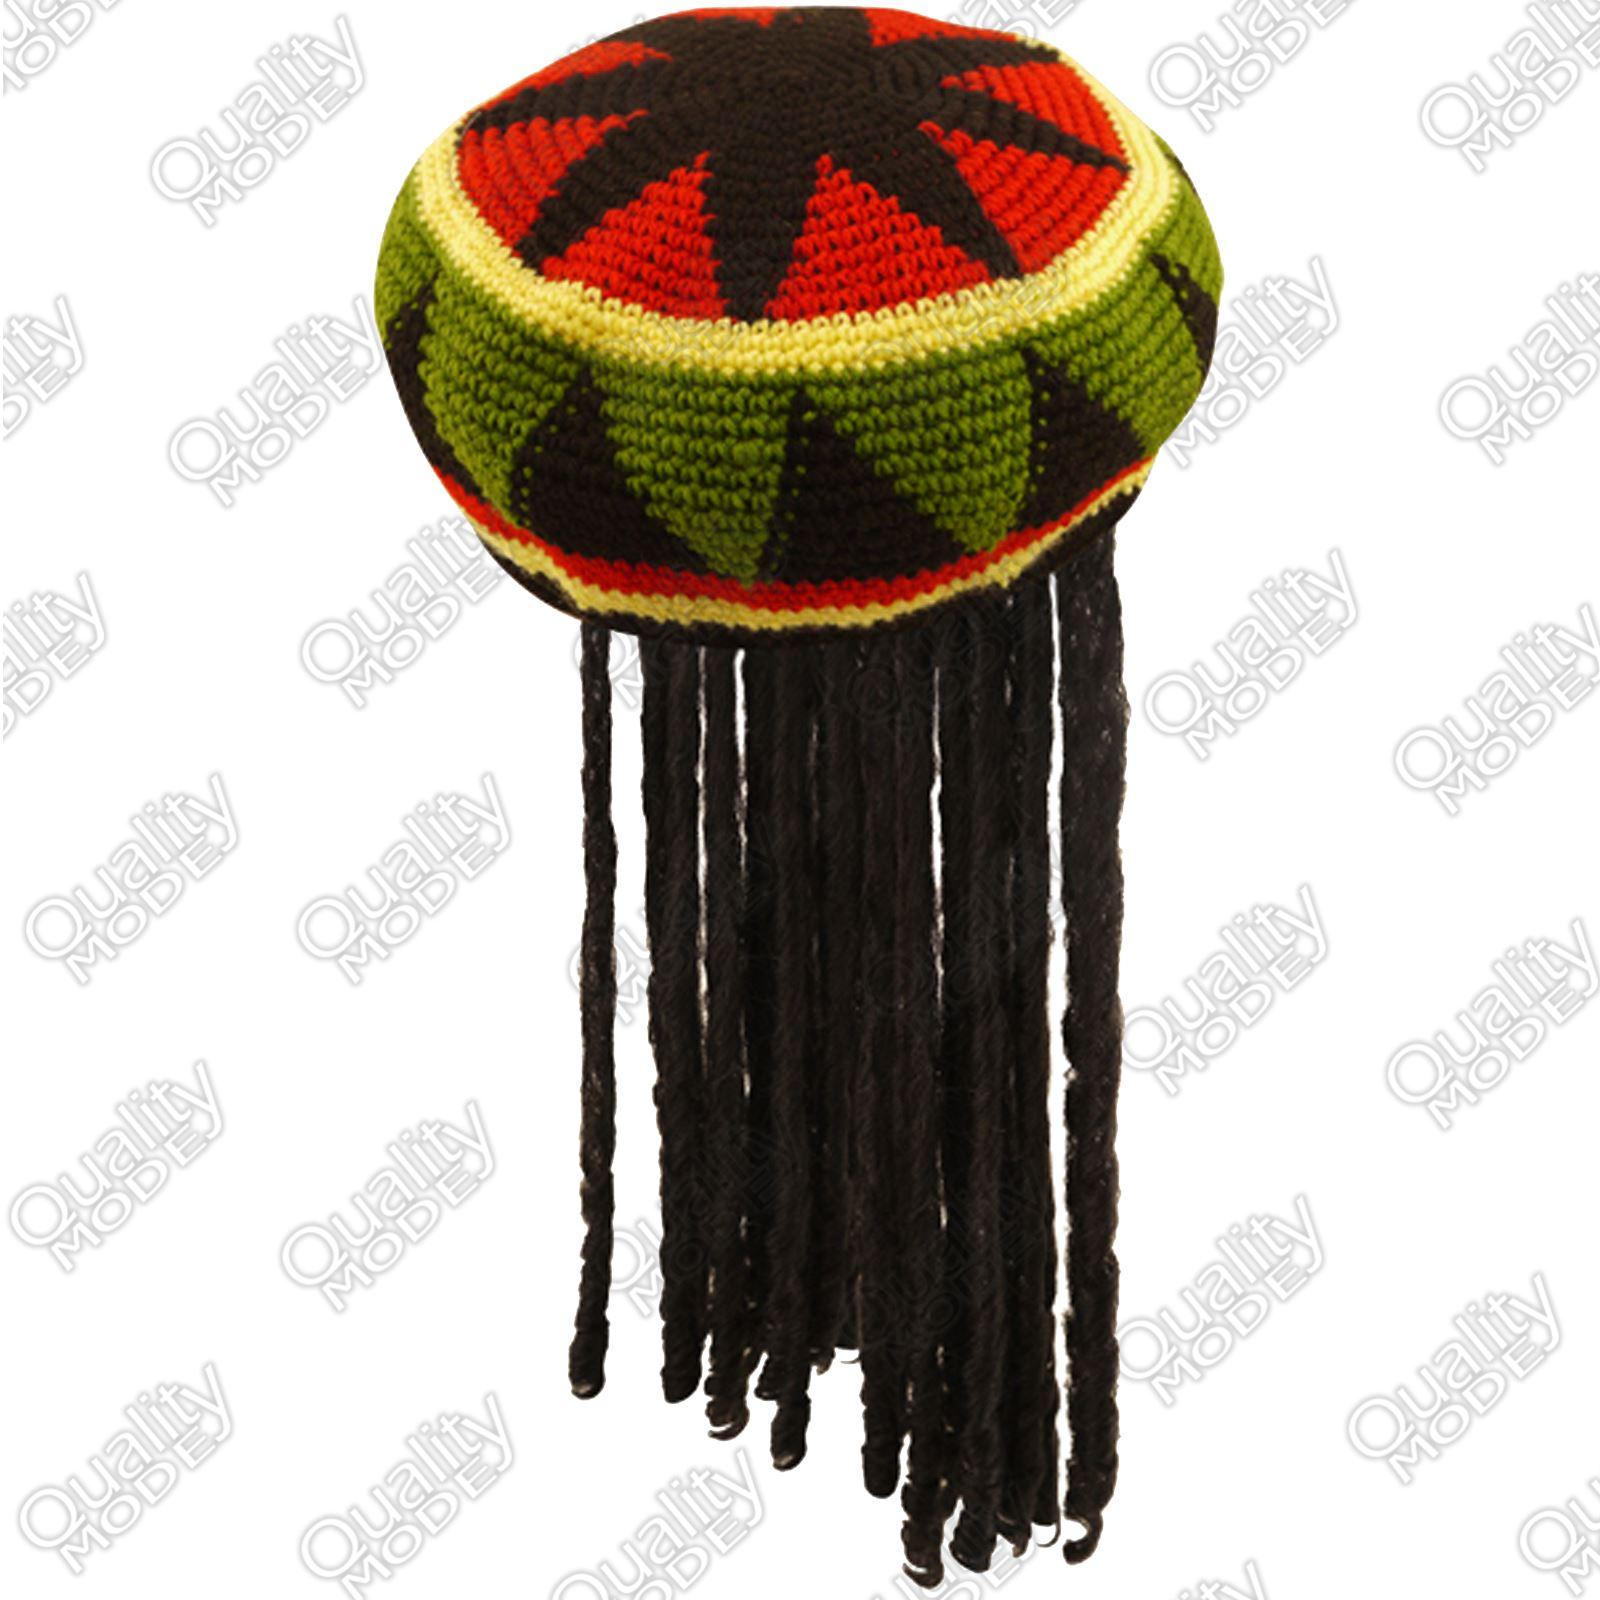 Rastafarian 2: ADULT RASTA JAMAICAN HAT BOB MARLEY KNITTED CAP WIG DREAD